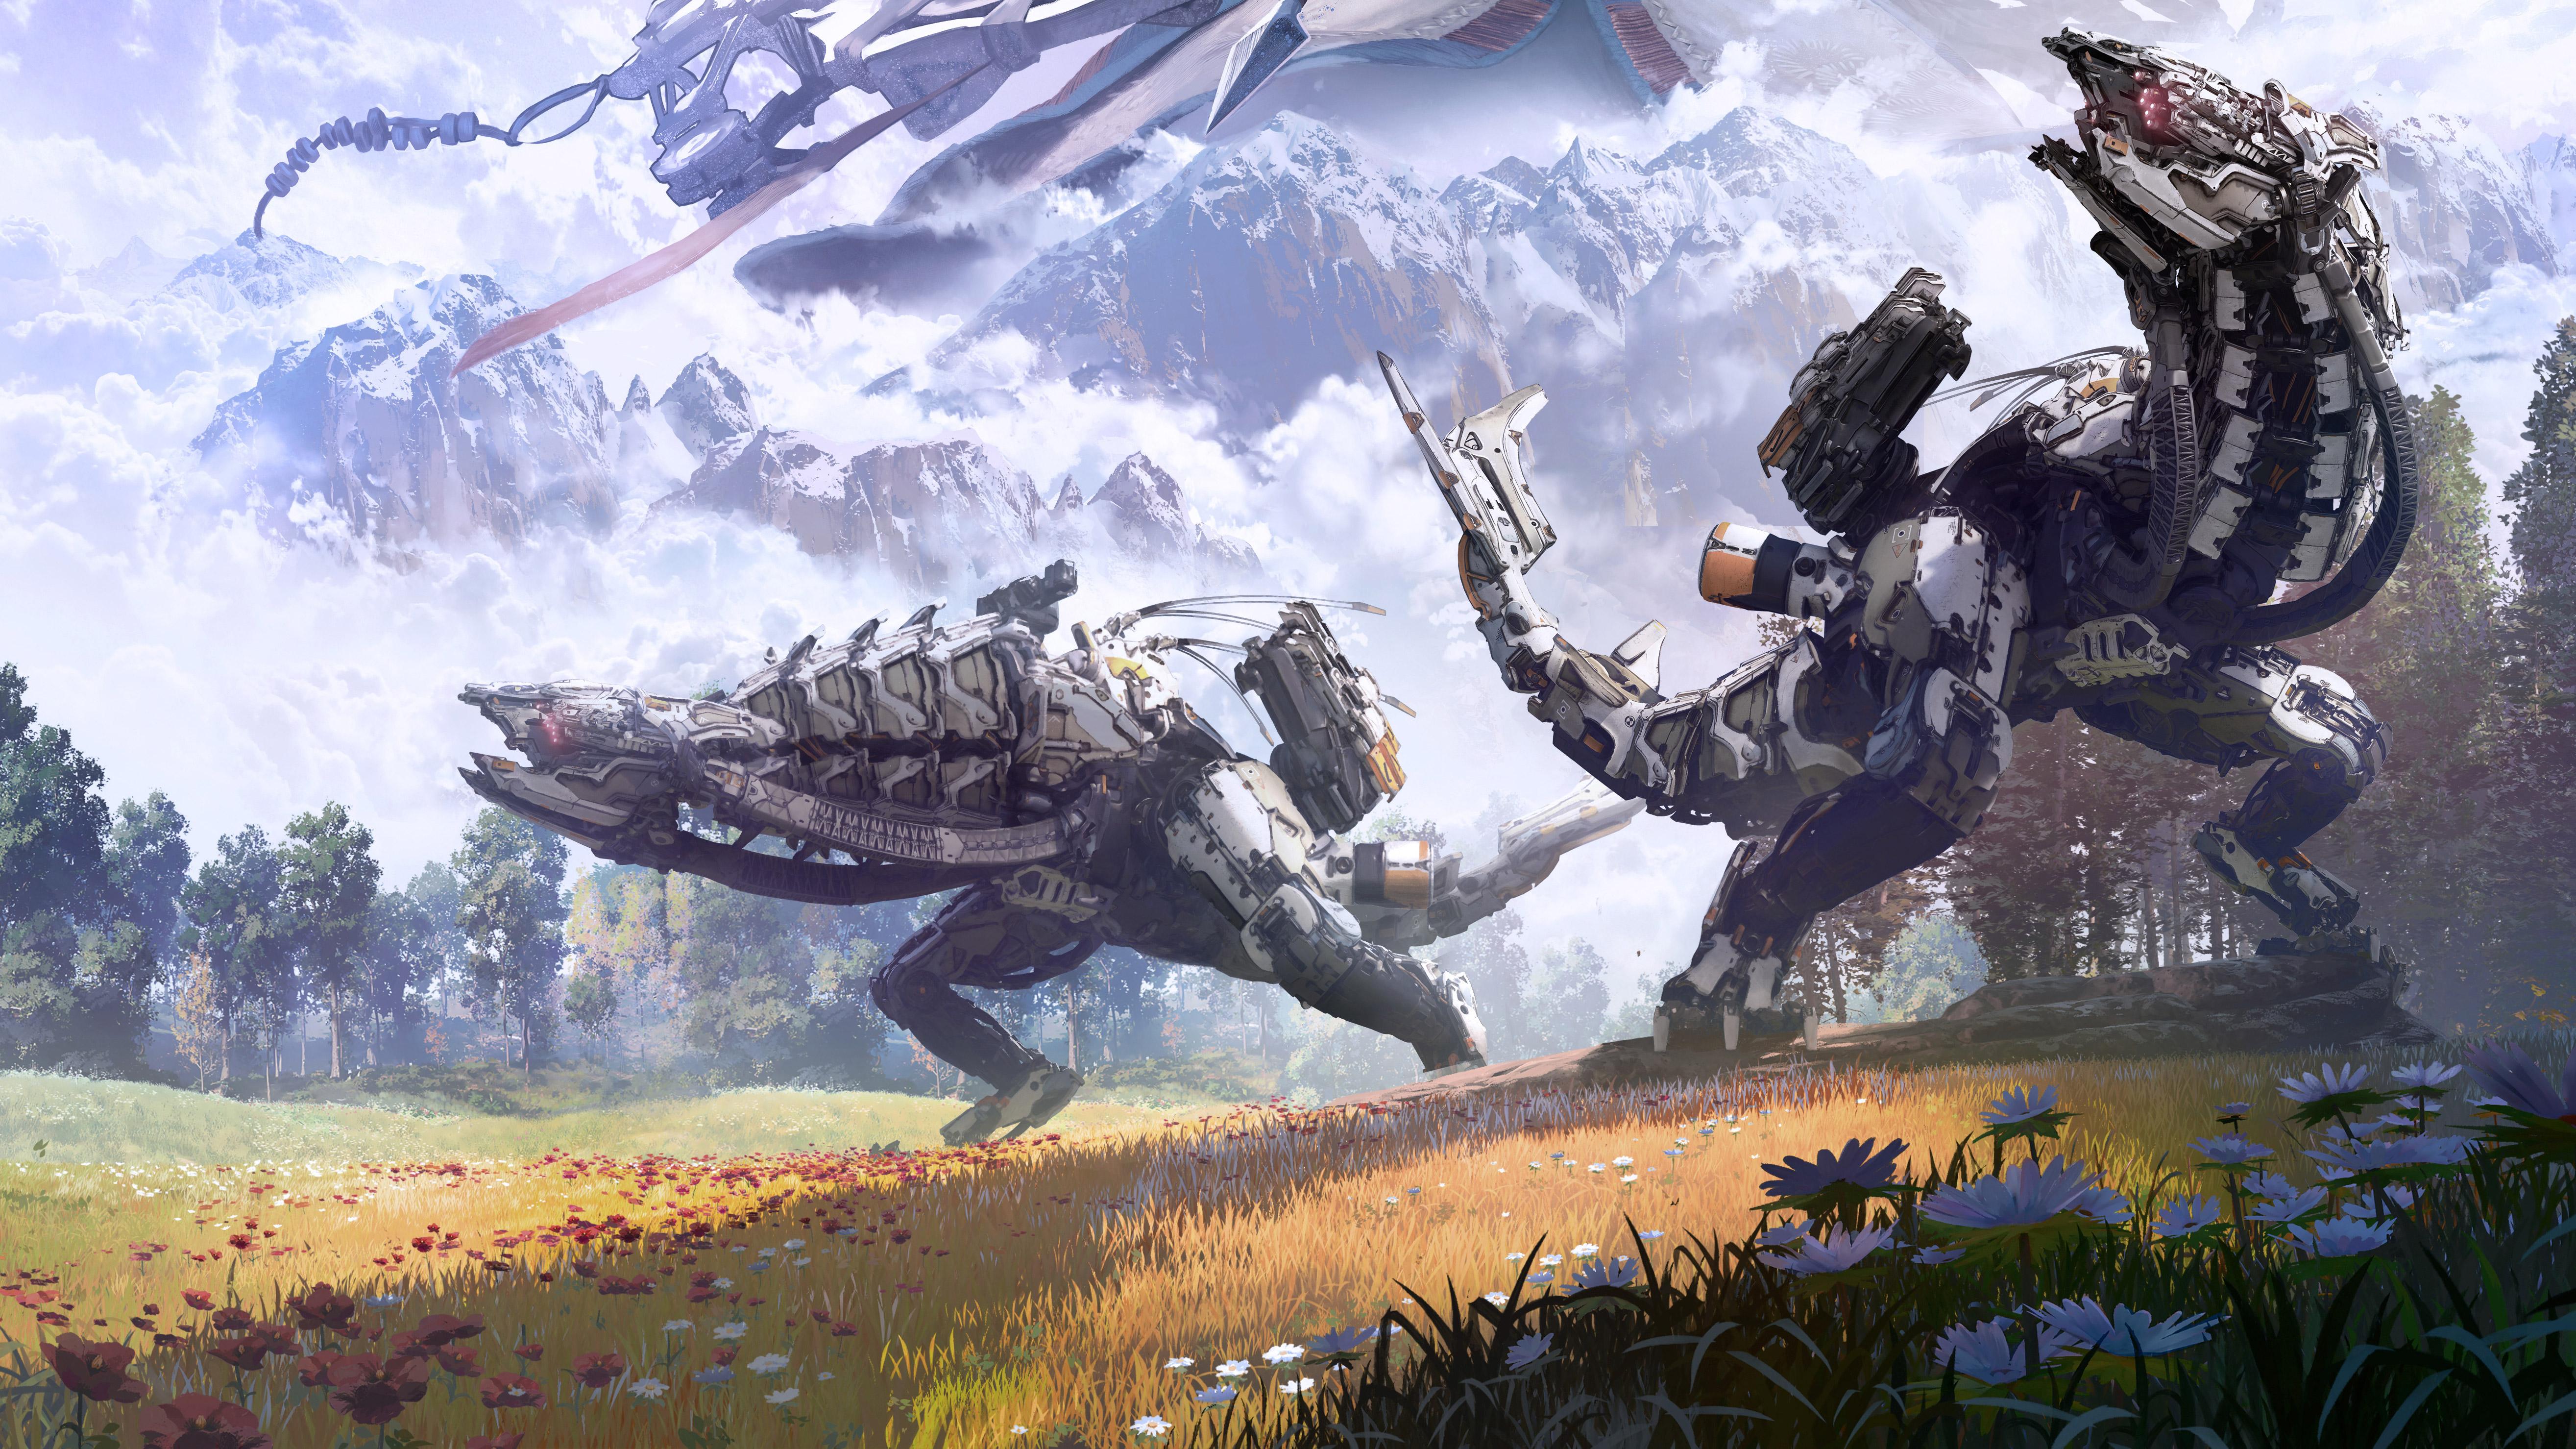 Horizon Zero Dawn Wallpapers: 2017 Horizon Zero Dawn Complete Edition, HD Games, 4k